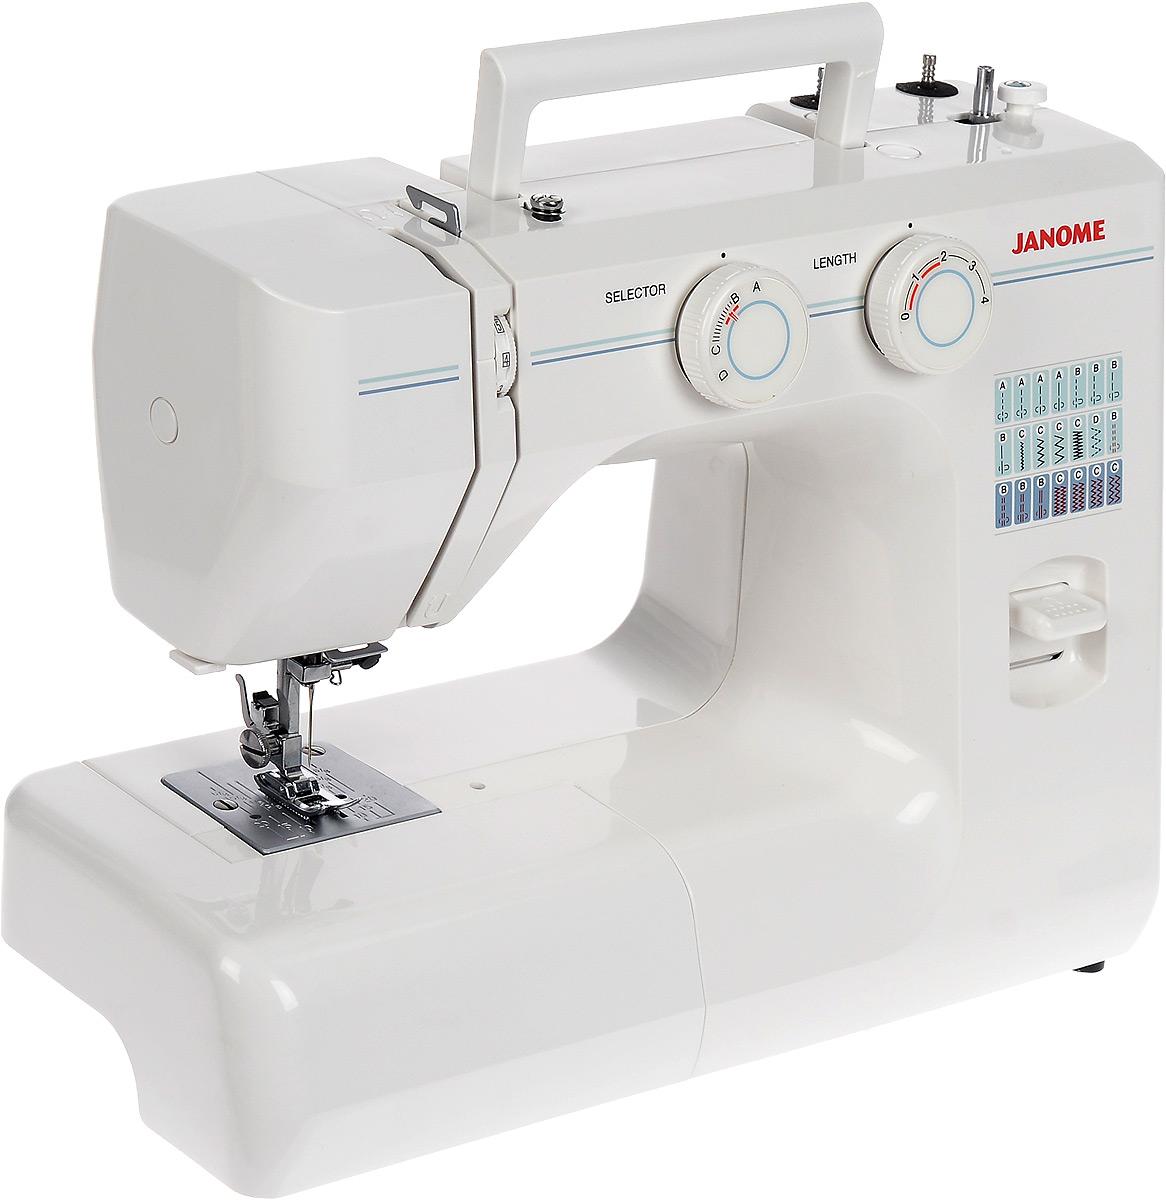 Janome 2004 швейная машина